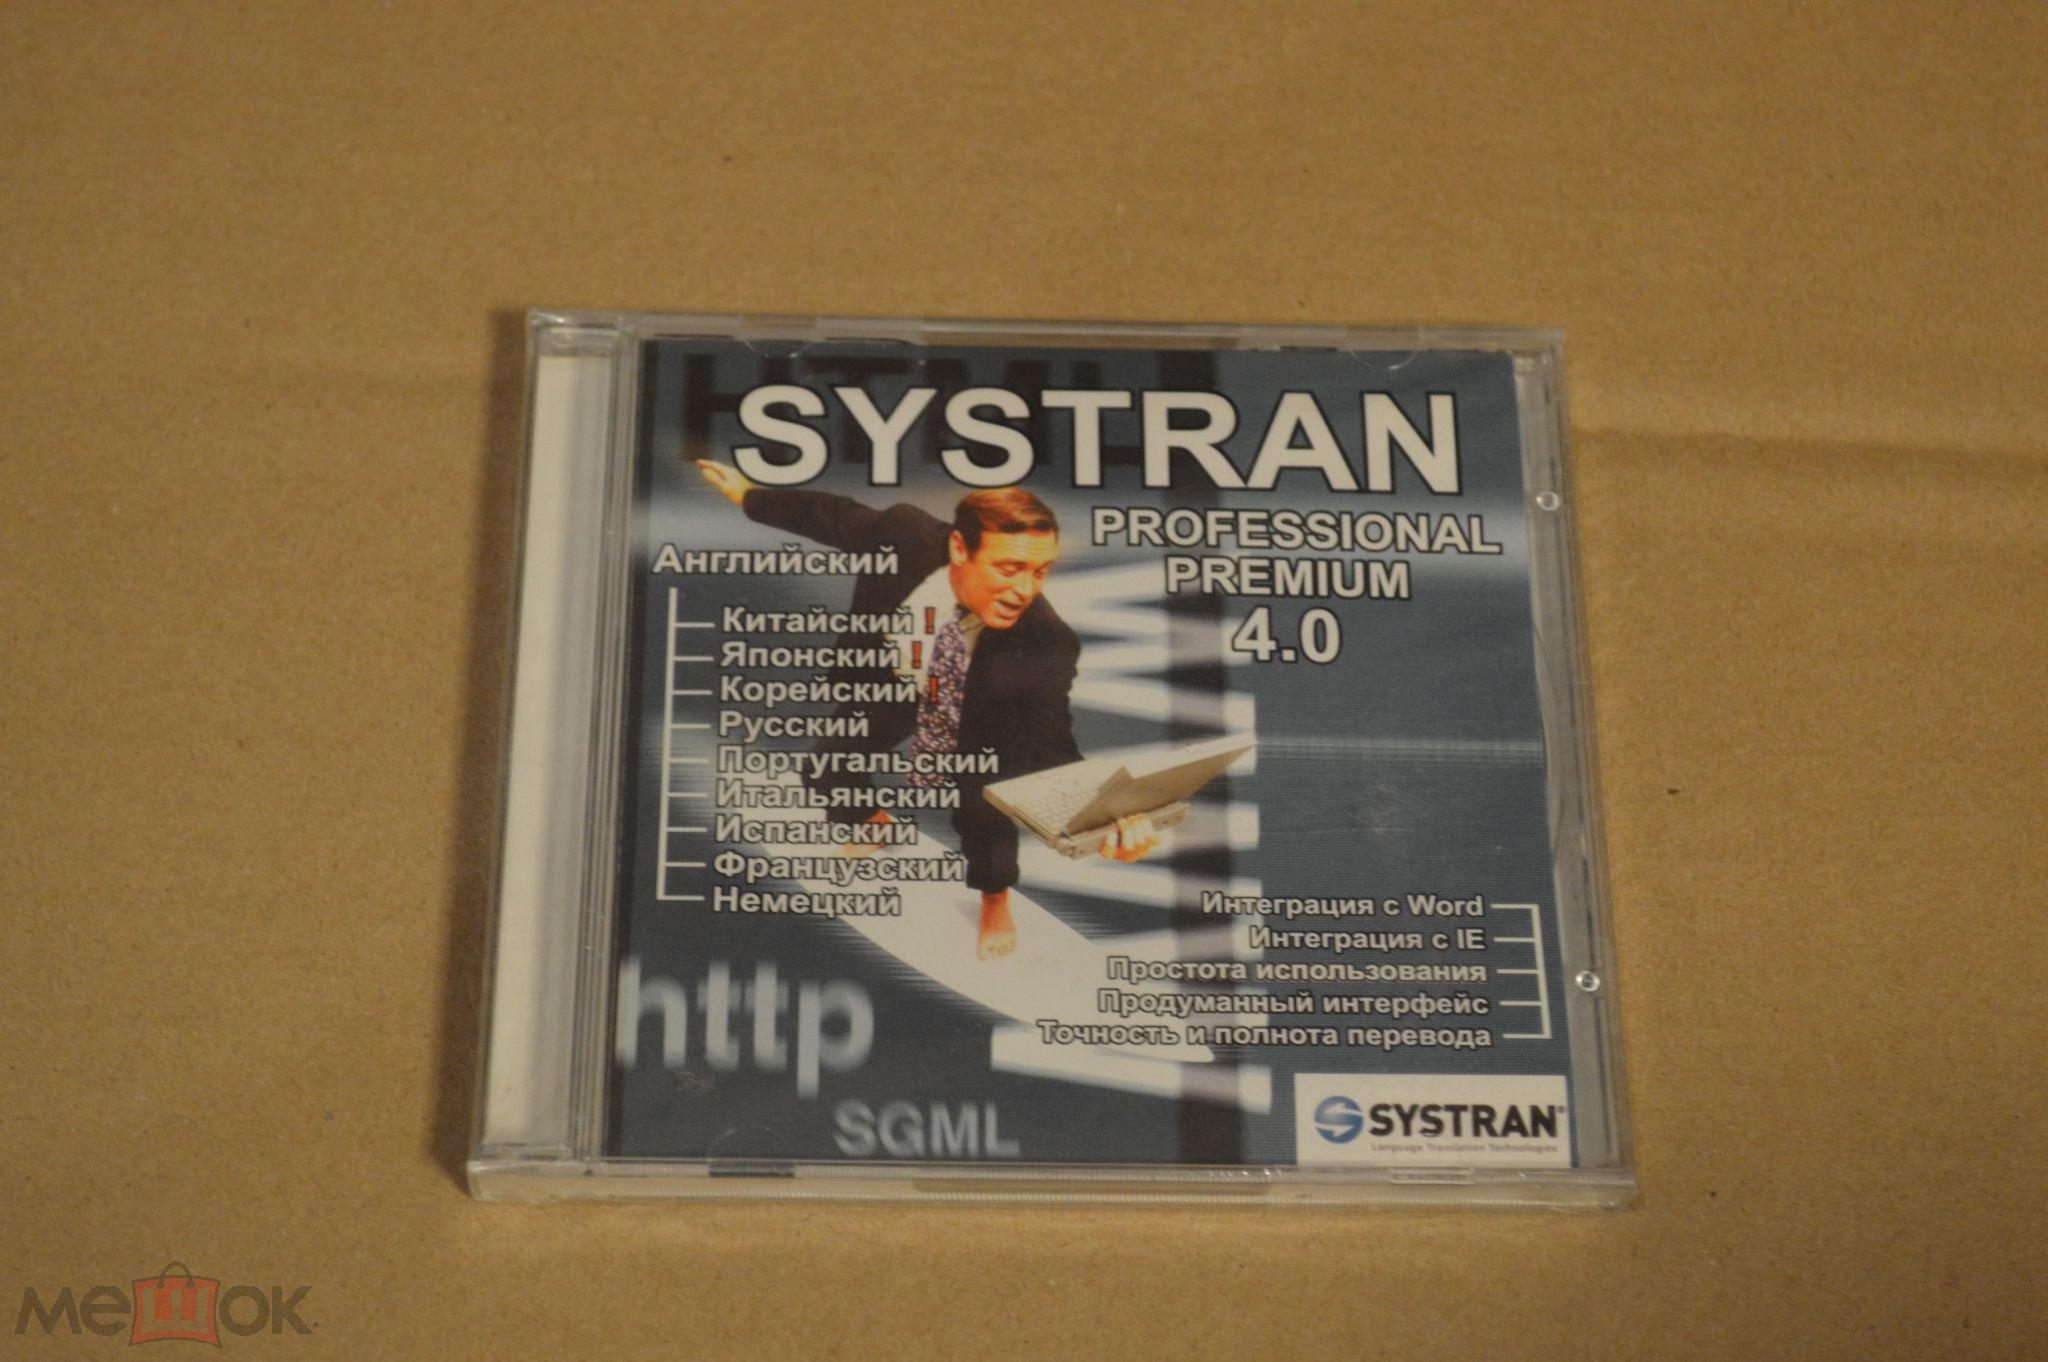 systran professional premium 4.0